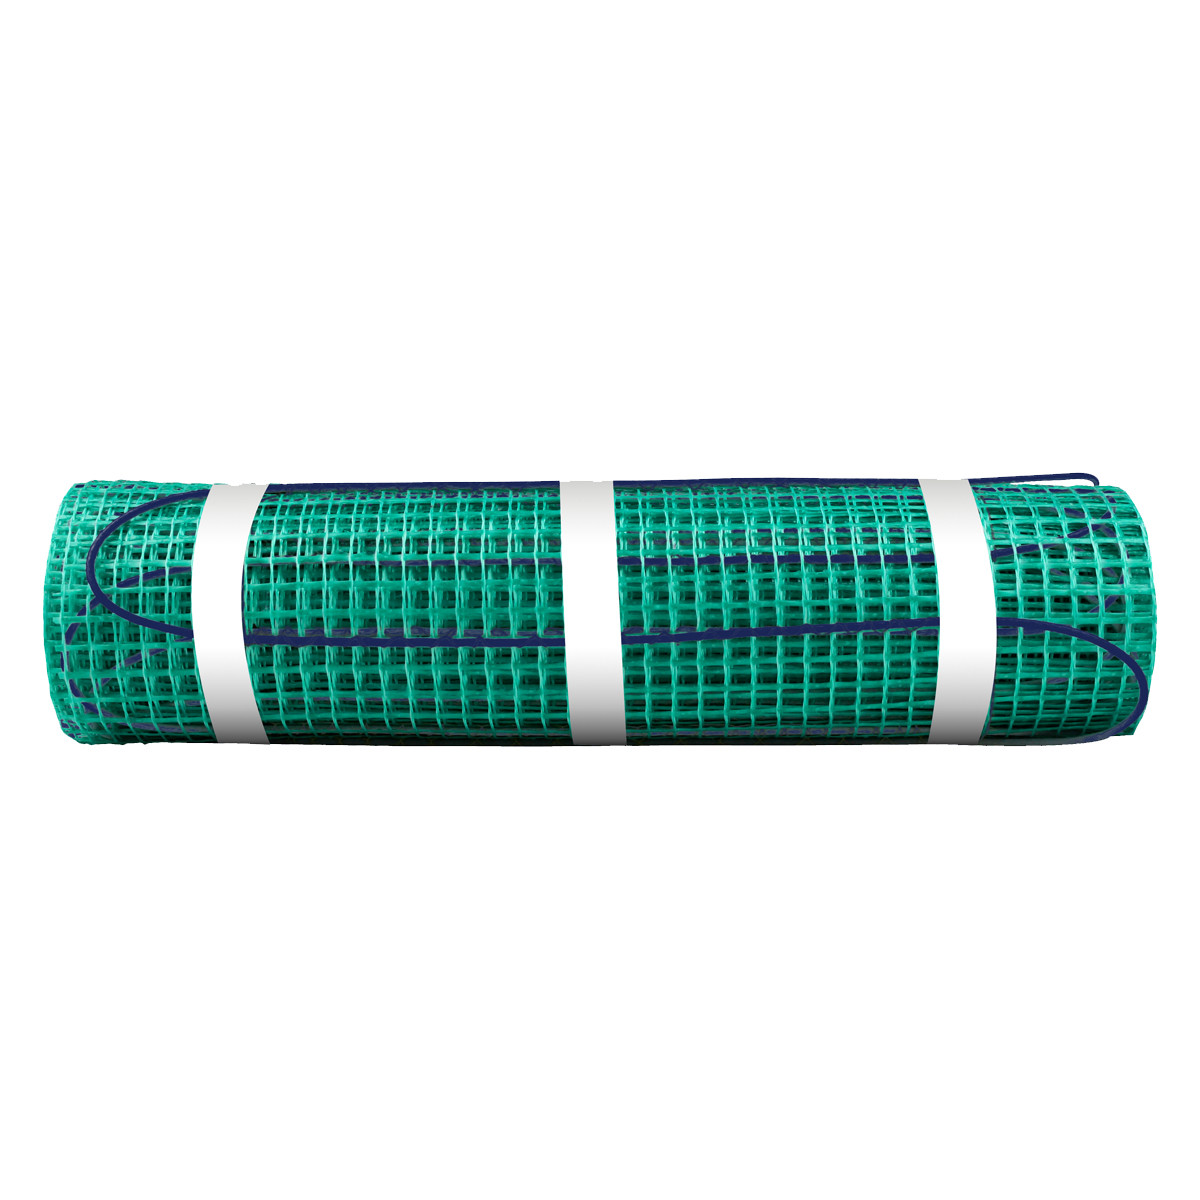 WarmlyYours TRT240-3.0x48 TempZone 240V 9.0A 3 Foot x 48 Foot Flex Roll